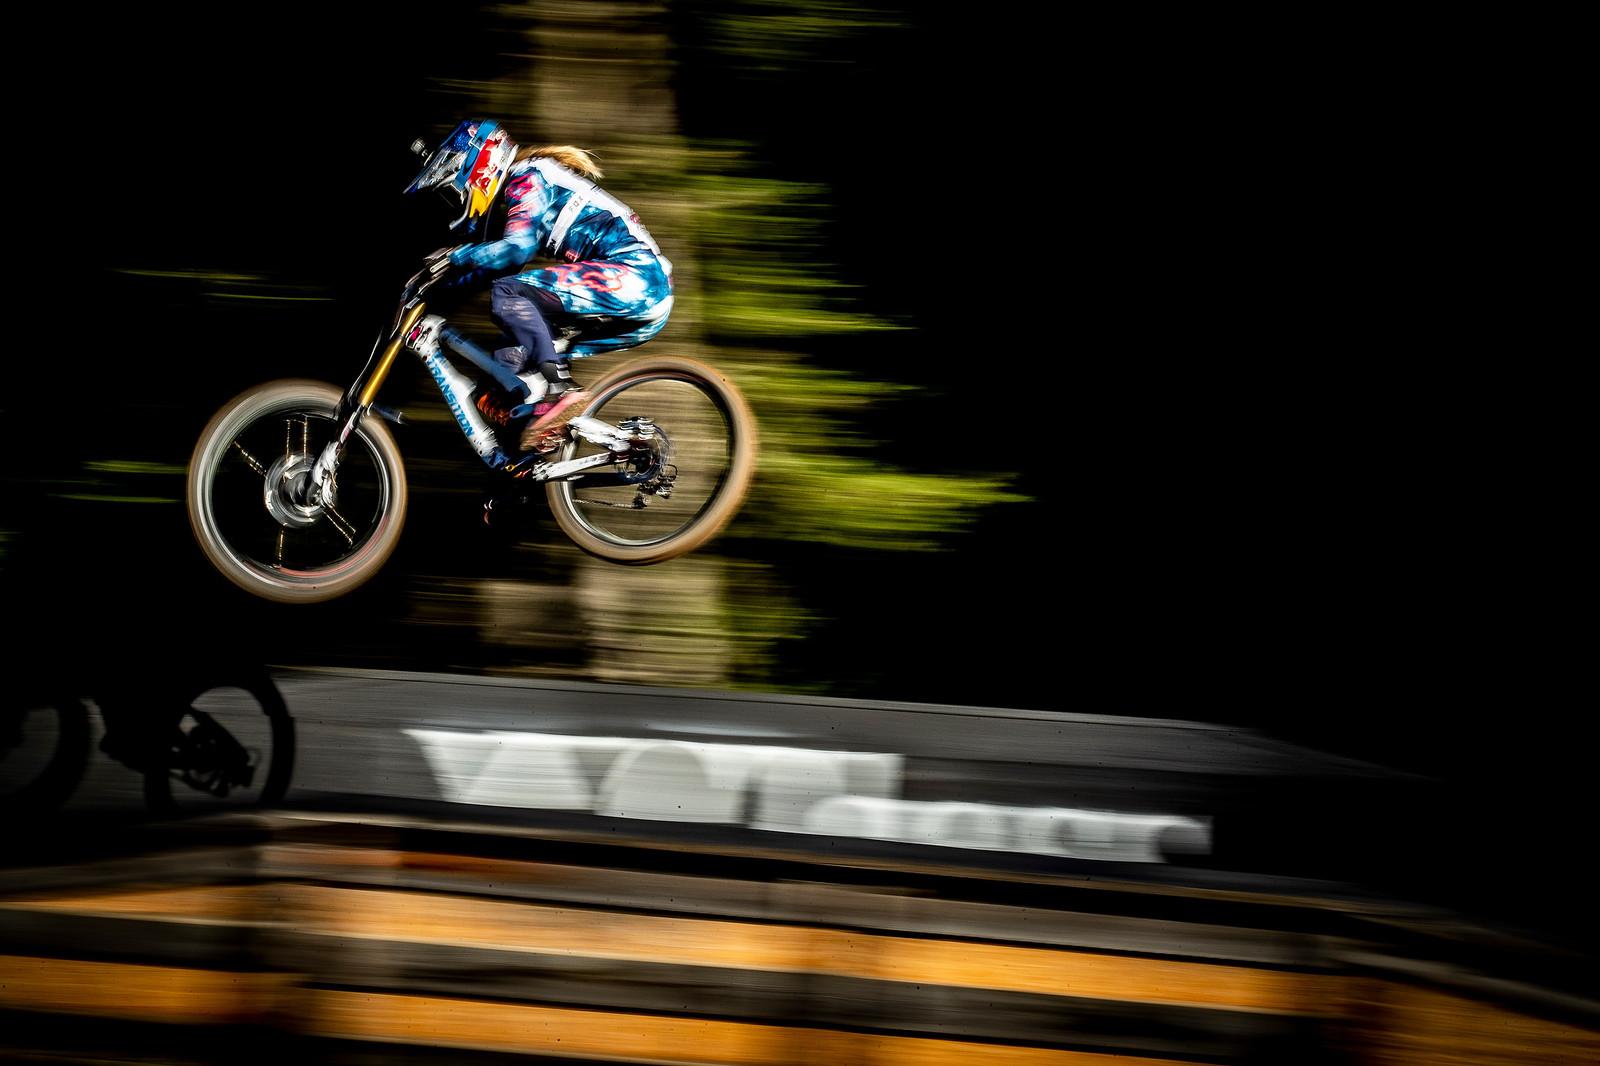 Tahnee Seagrave - WORLD CHAMPS WHIPFEST - Mountain Biking Pictures - Vital MTB